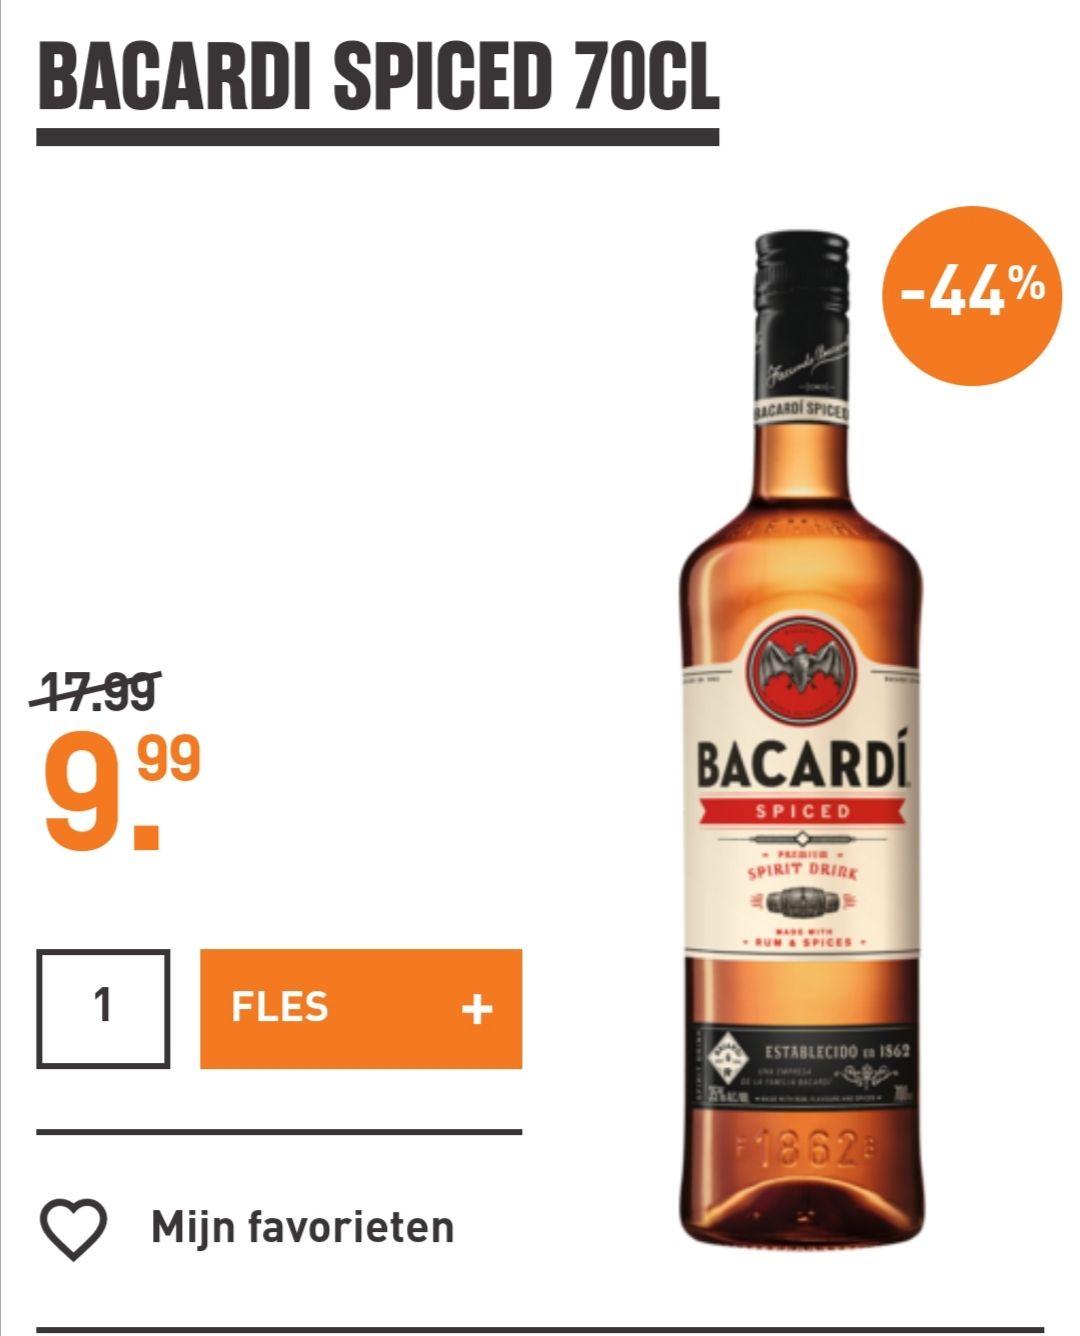 Bacardi Oakheart/Spiced